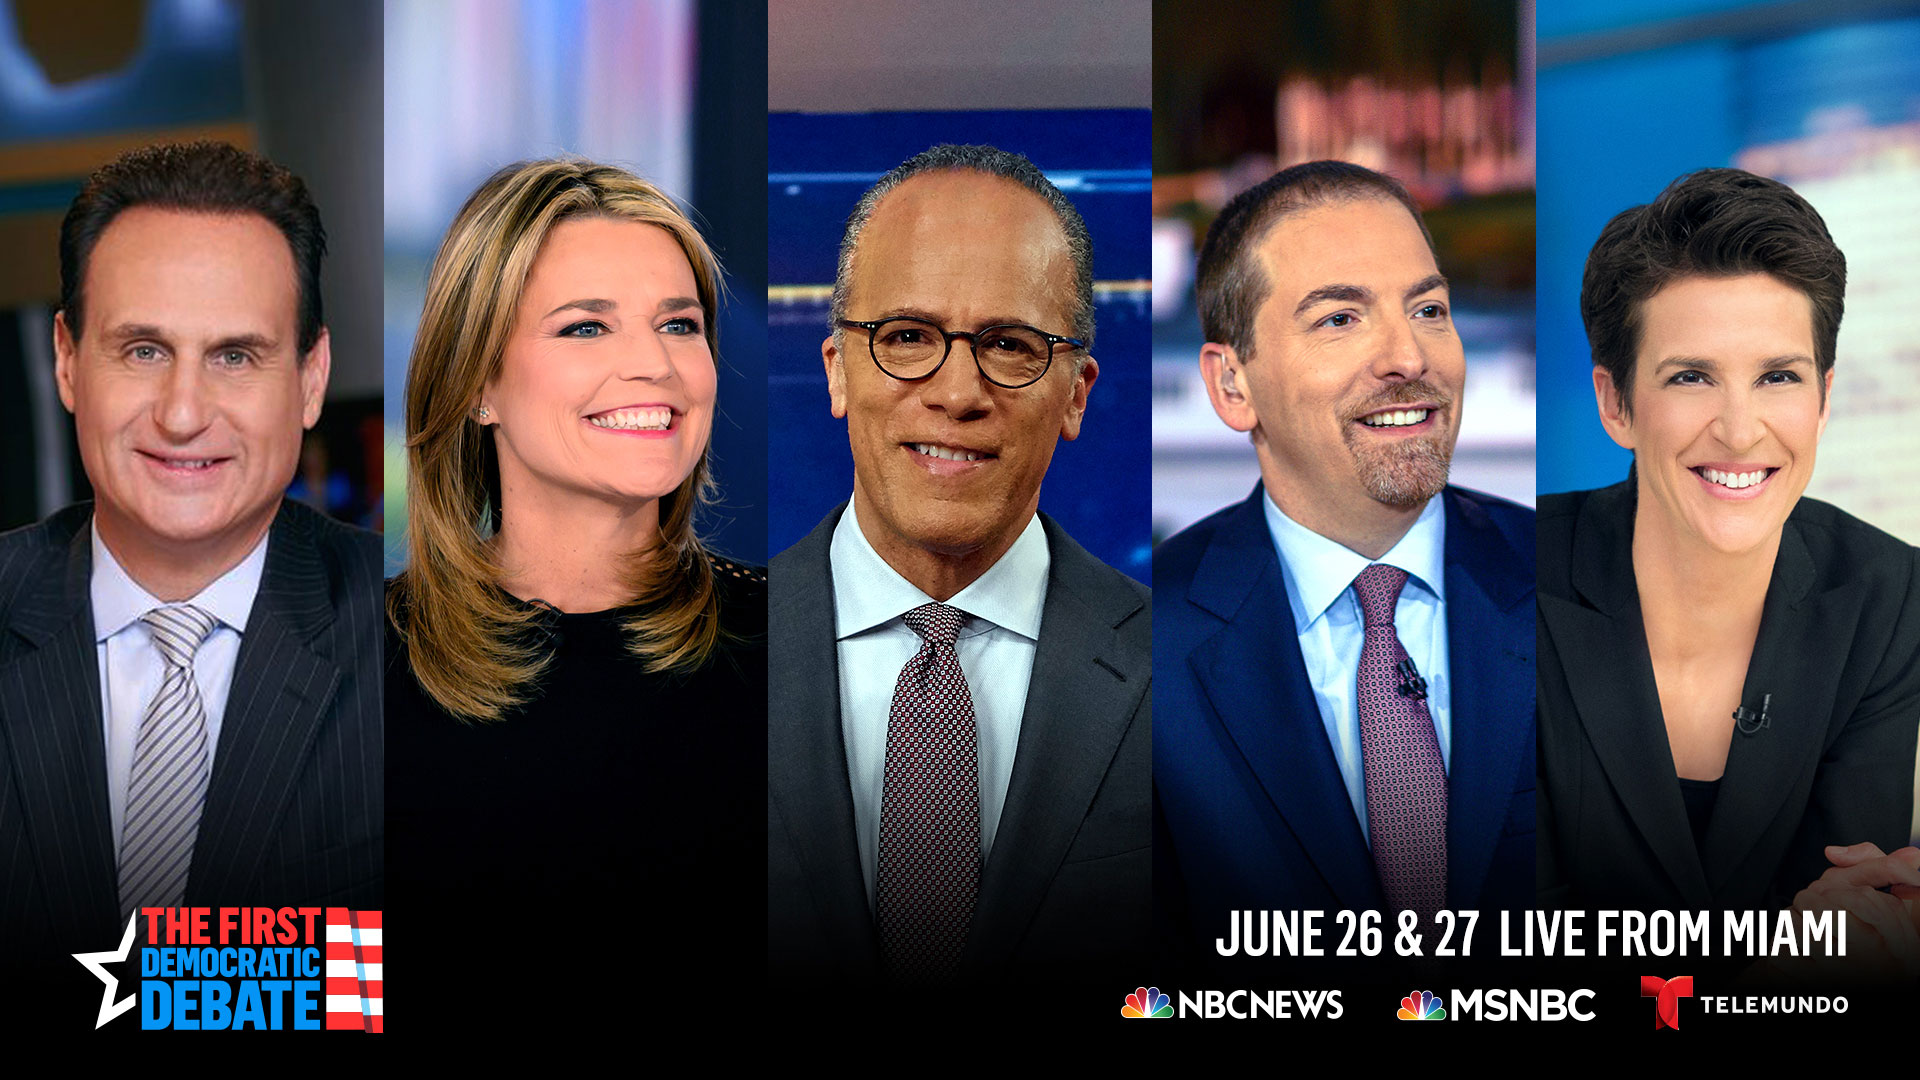 NBC Unveils Debate Lineups, And There's a Group of Death: Biden. Bernie. Buttigieg. Harris